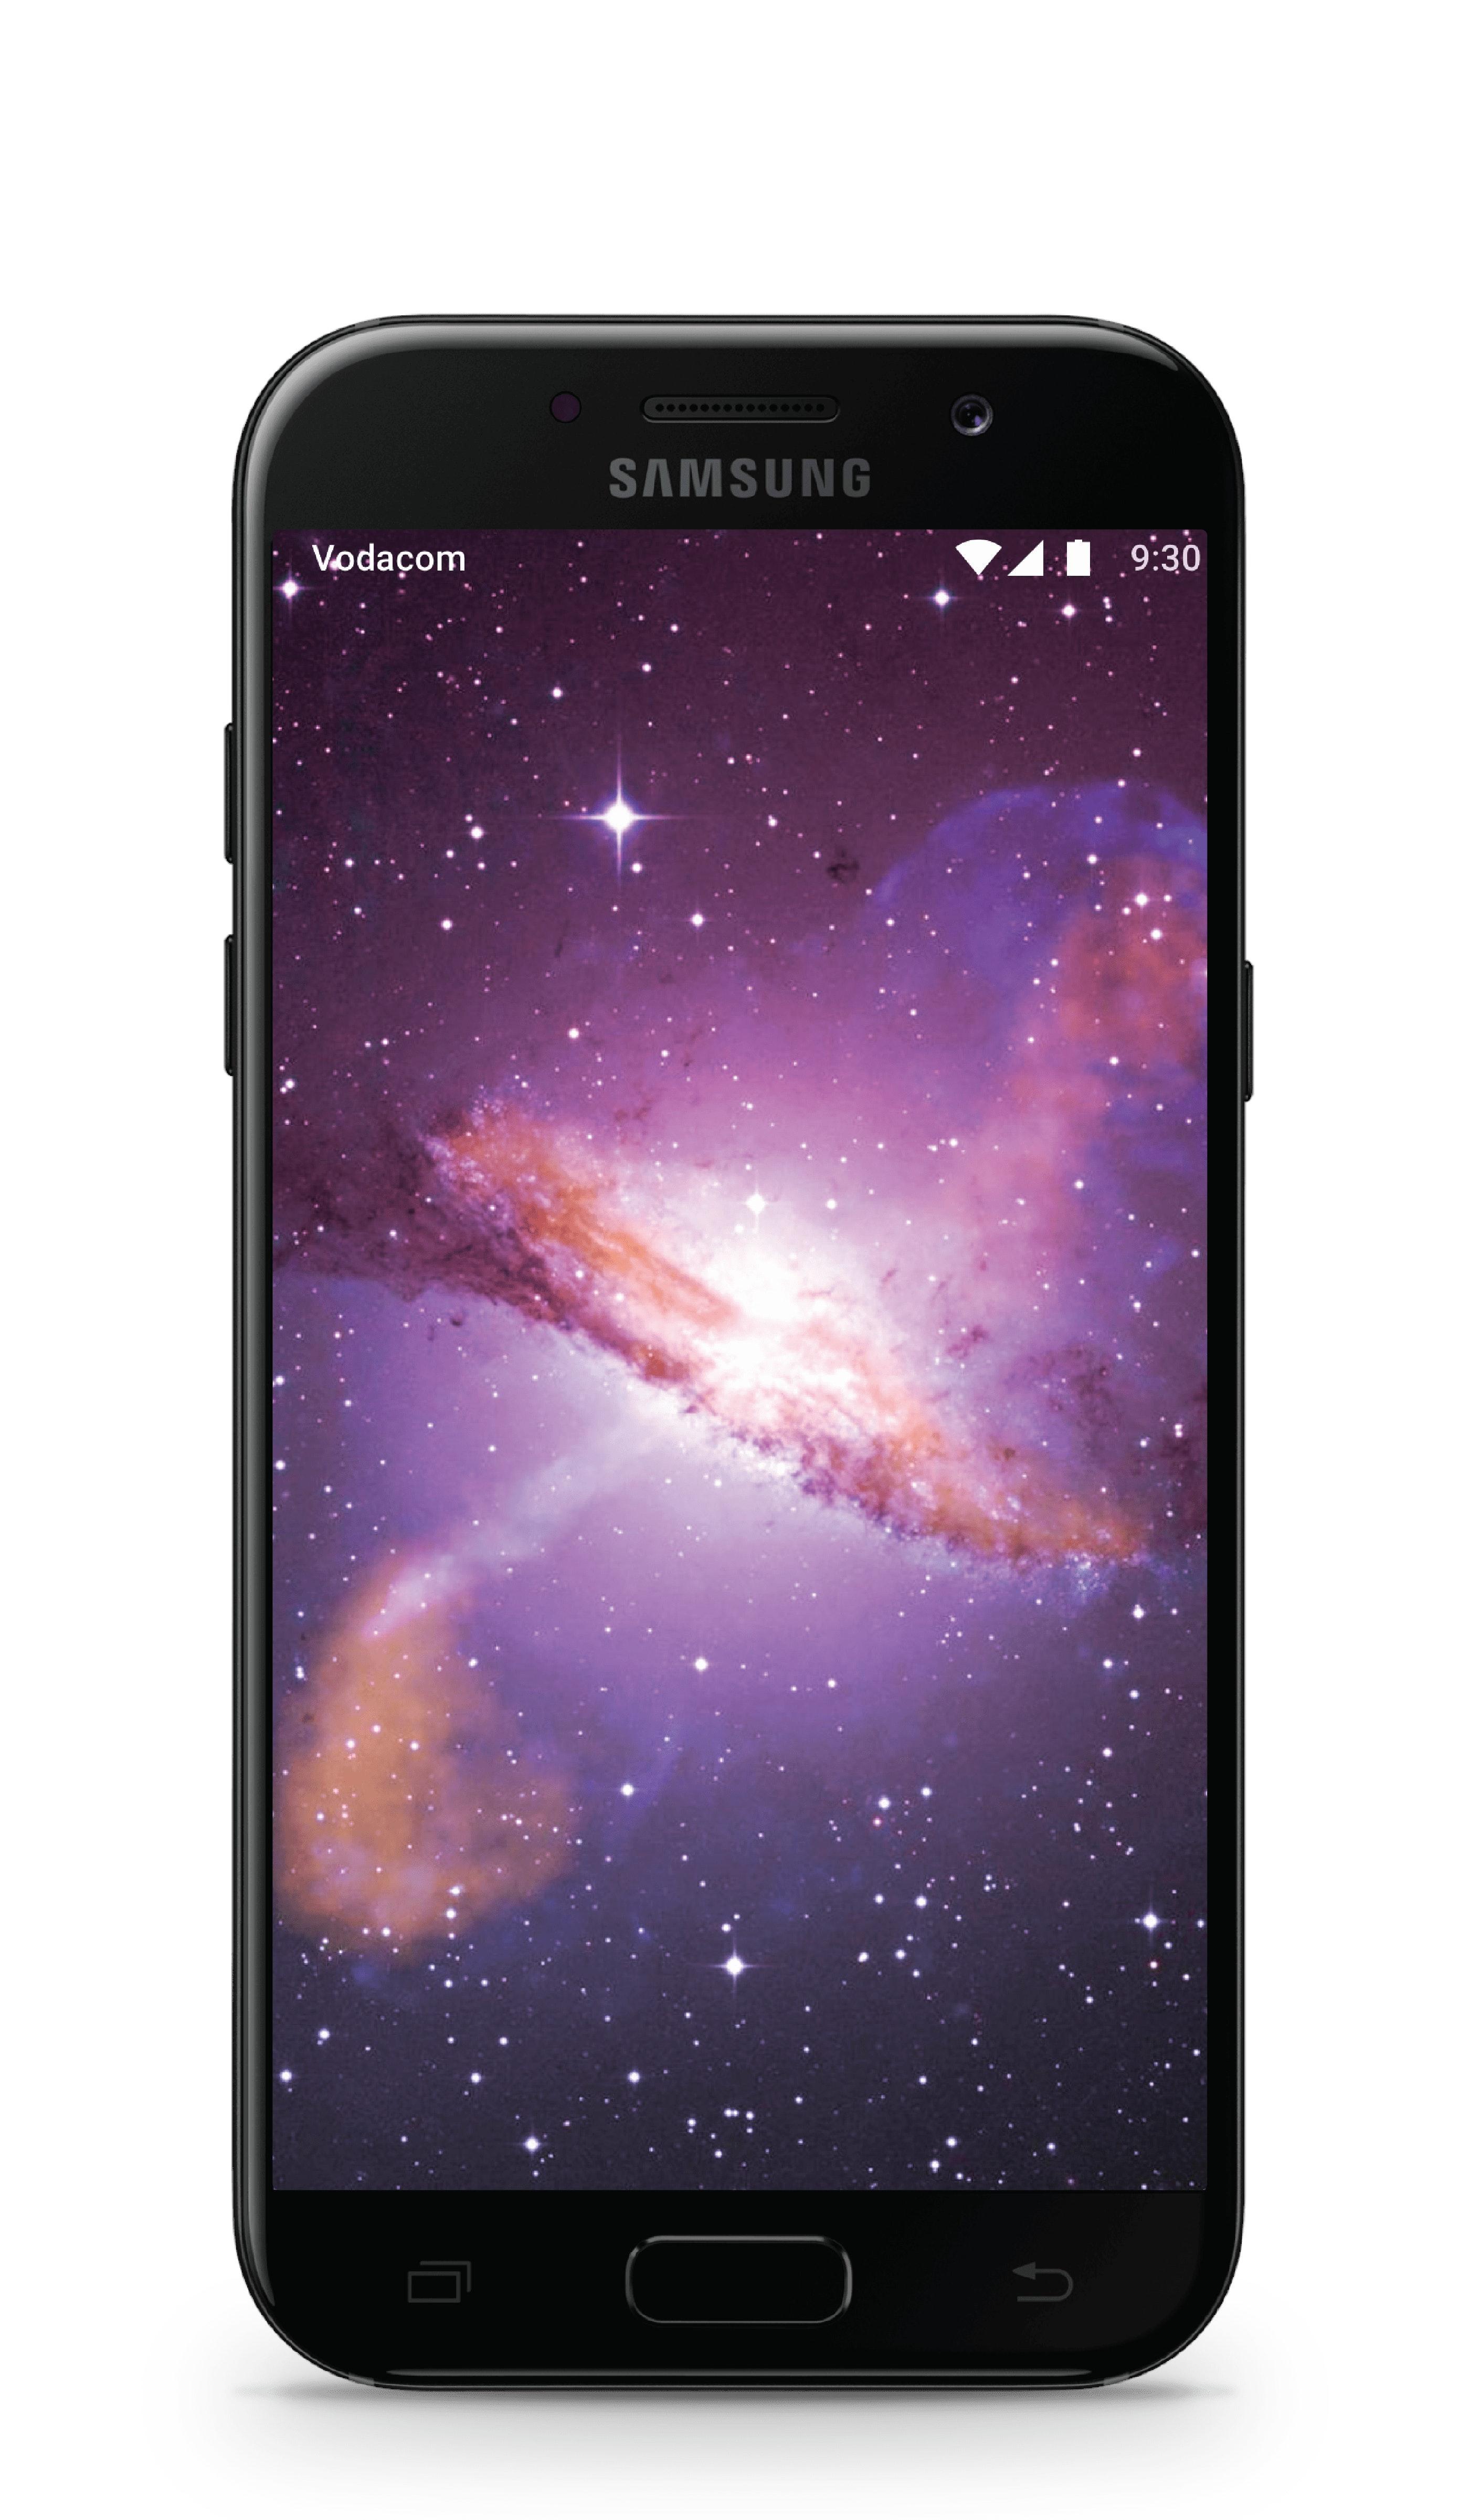 Samsung Galaxy A5 (2017) image